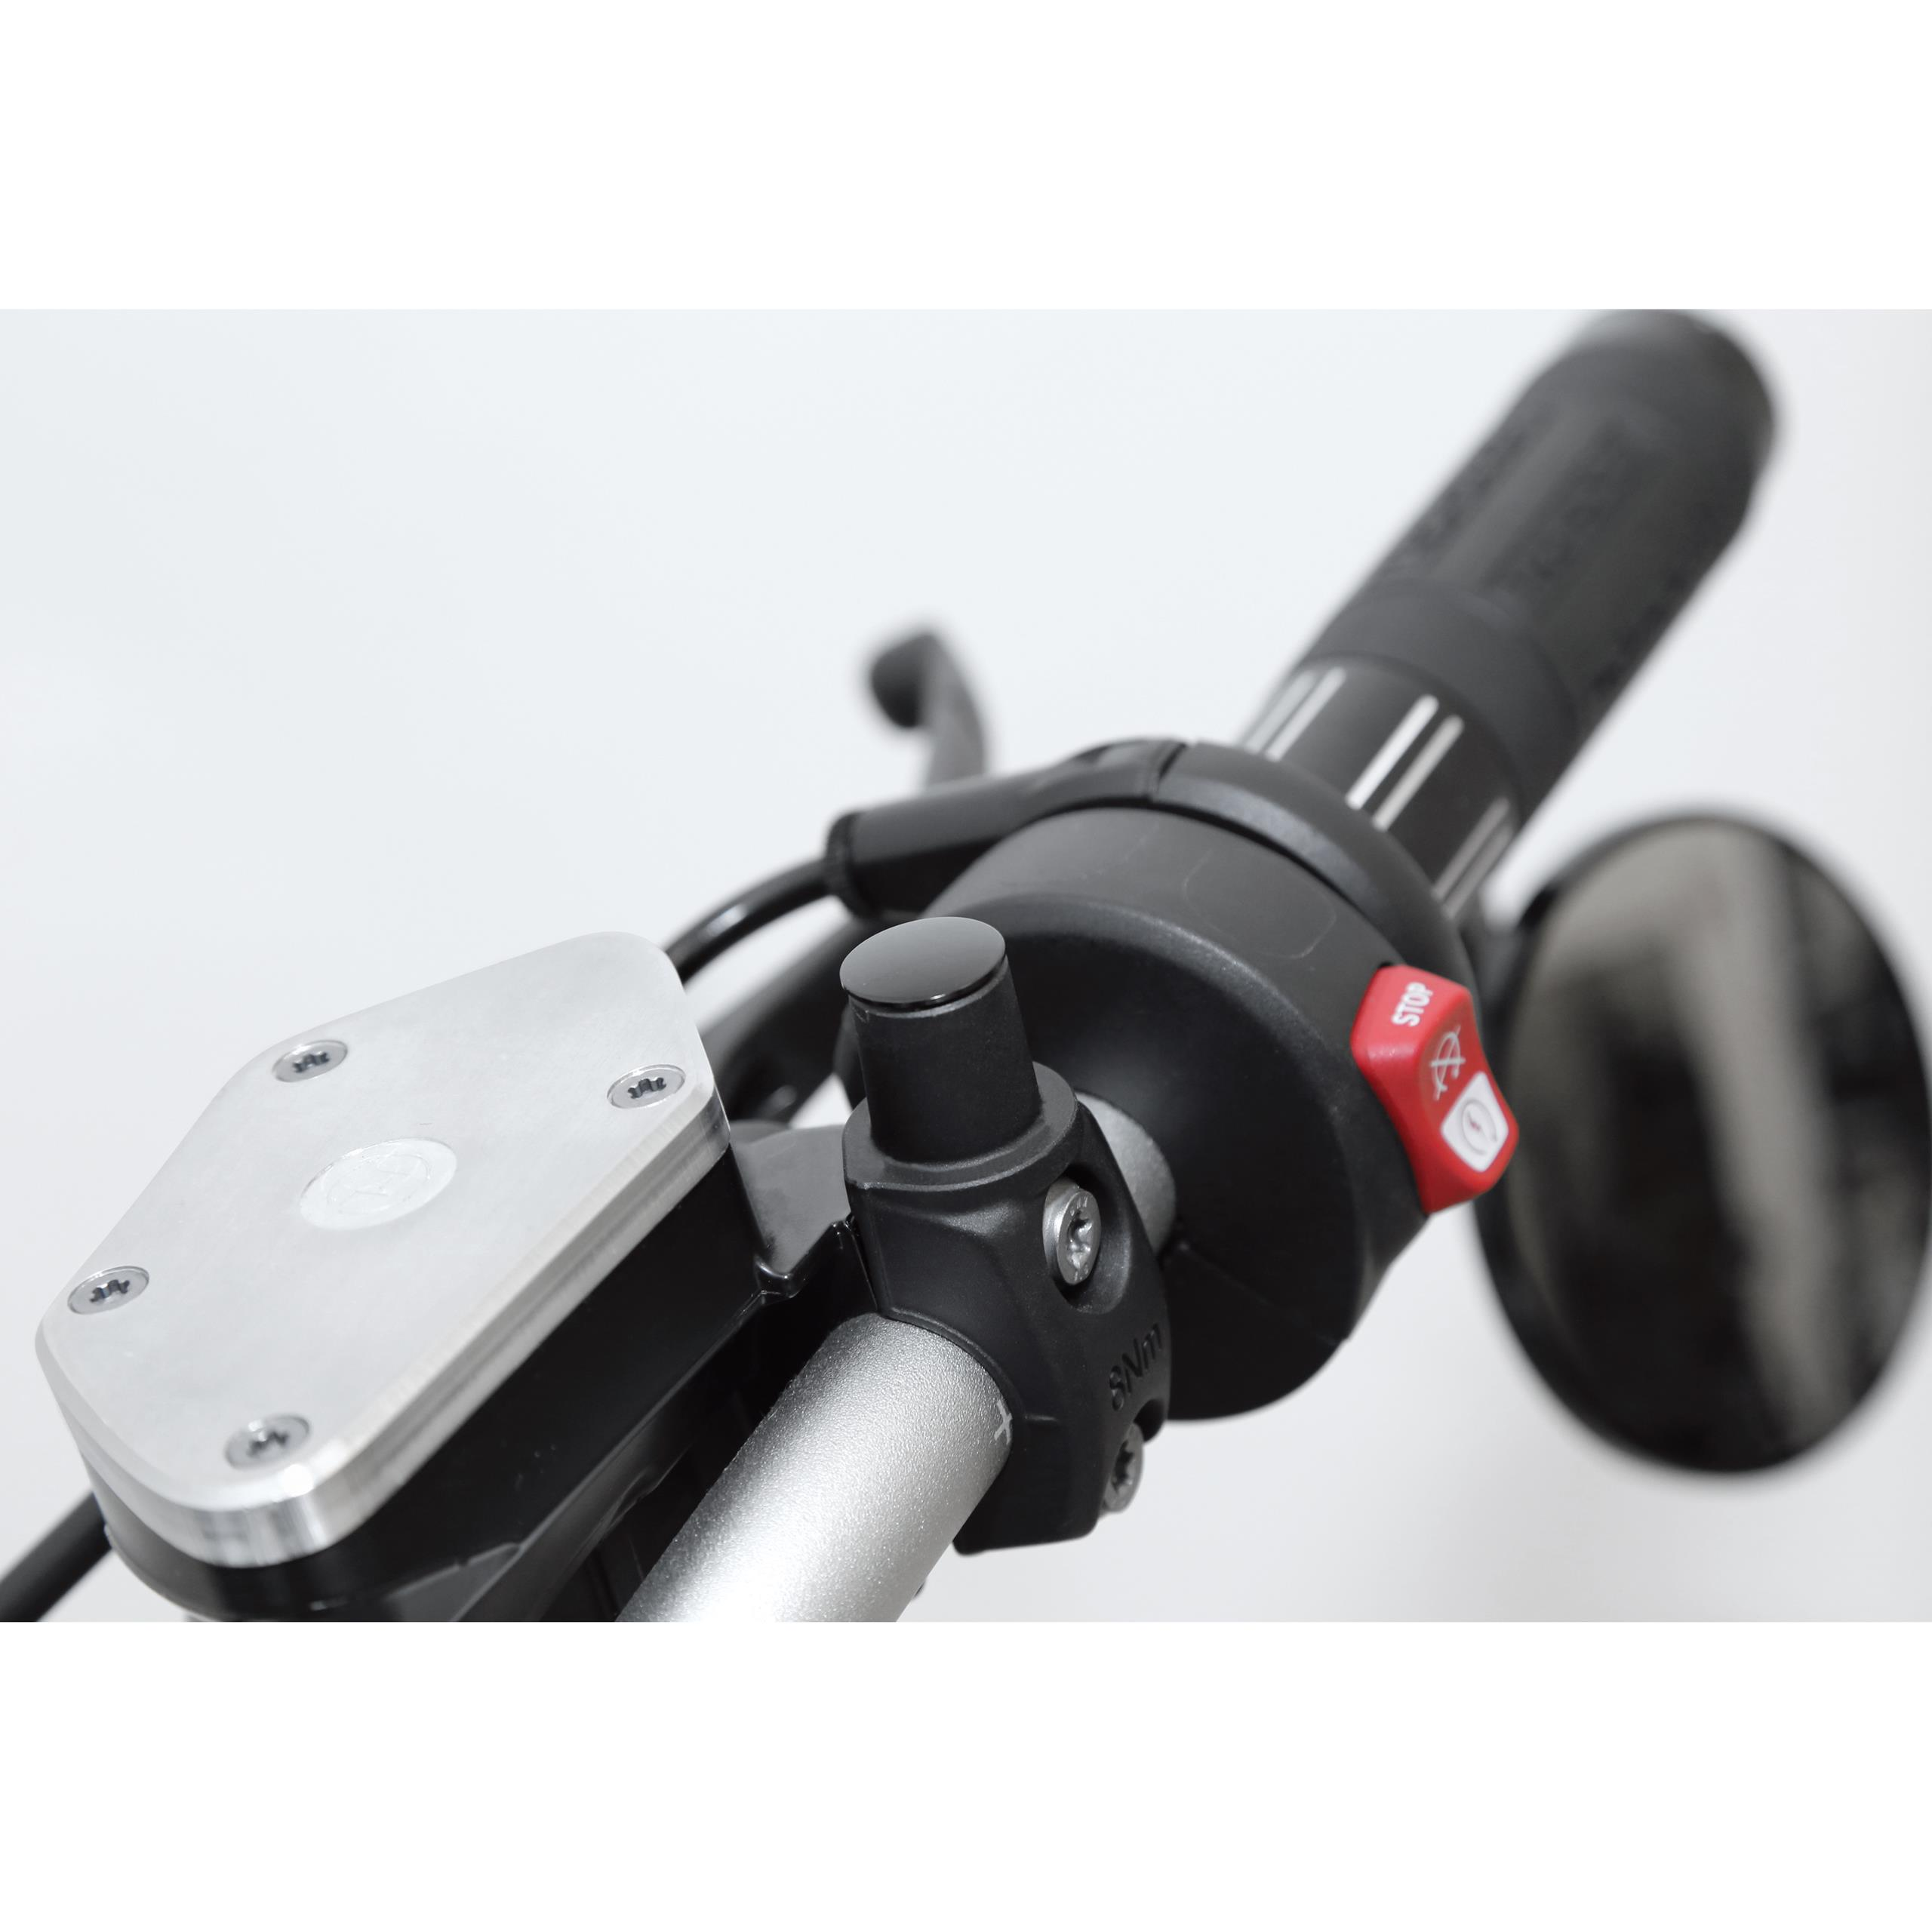 Abdeckkappenpaar Alu CNC f/ür M10 Gewinde Motorrad Spiegel Blindstopfen passend f/ür Kawasaki Z1000 Z900 Z800 Z750 Z650 ZX6R ZX10R ZX9R ZX14R Z400 Z300 Z250